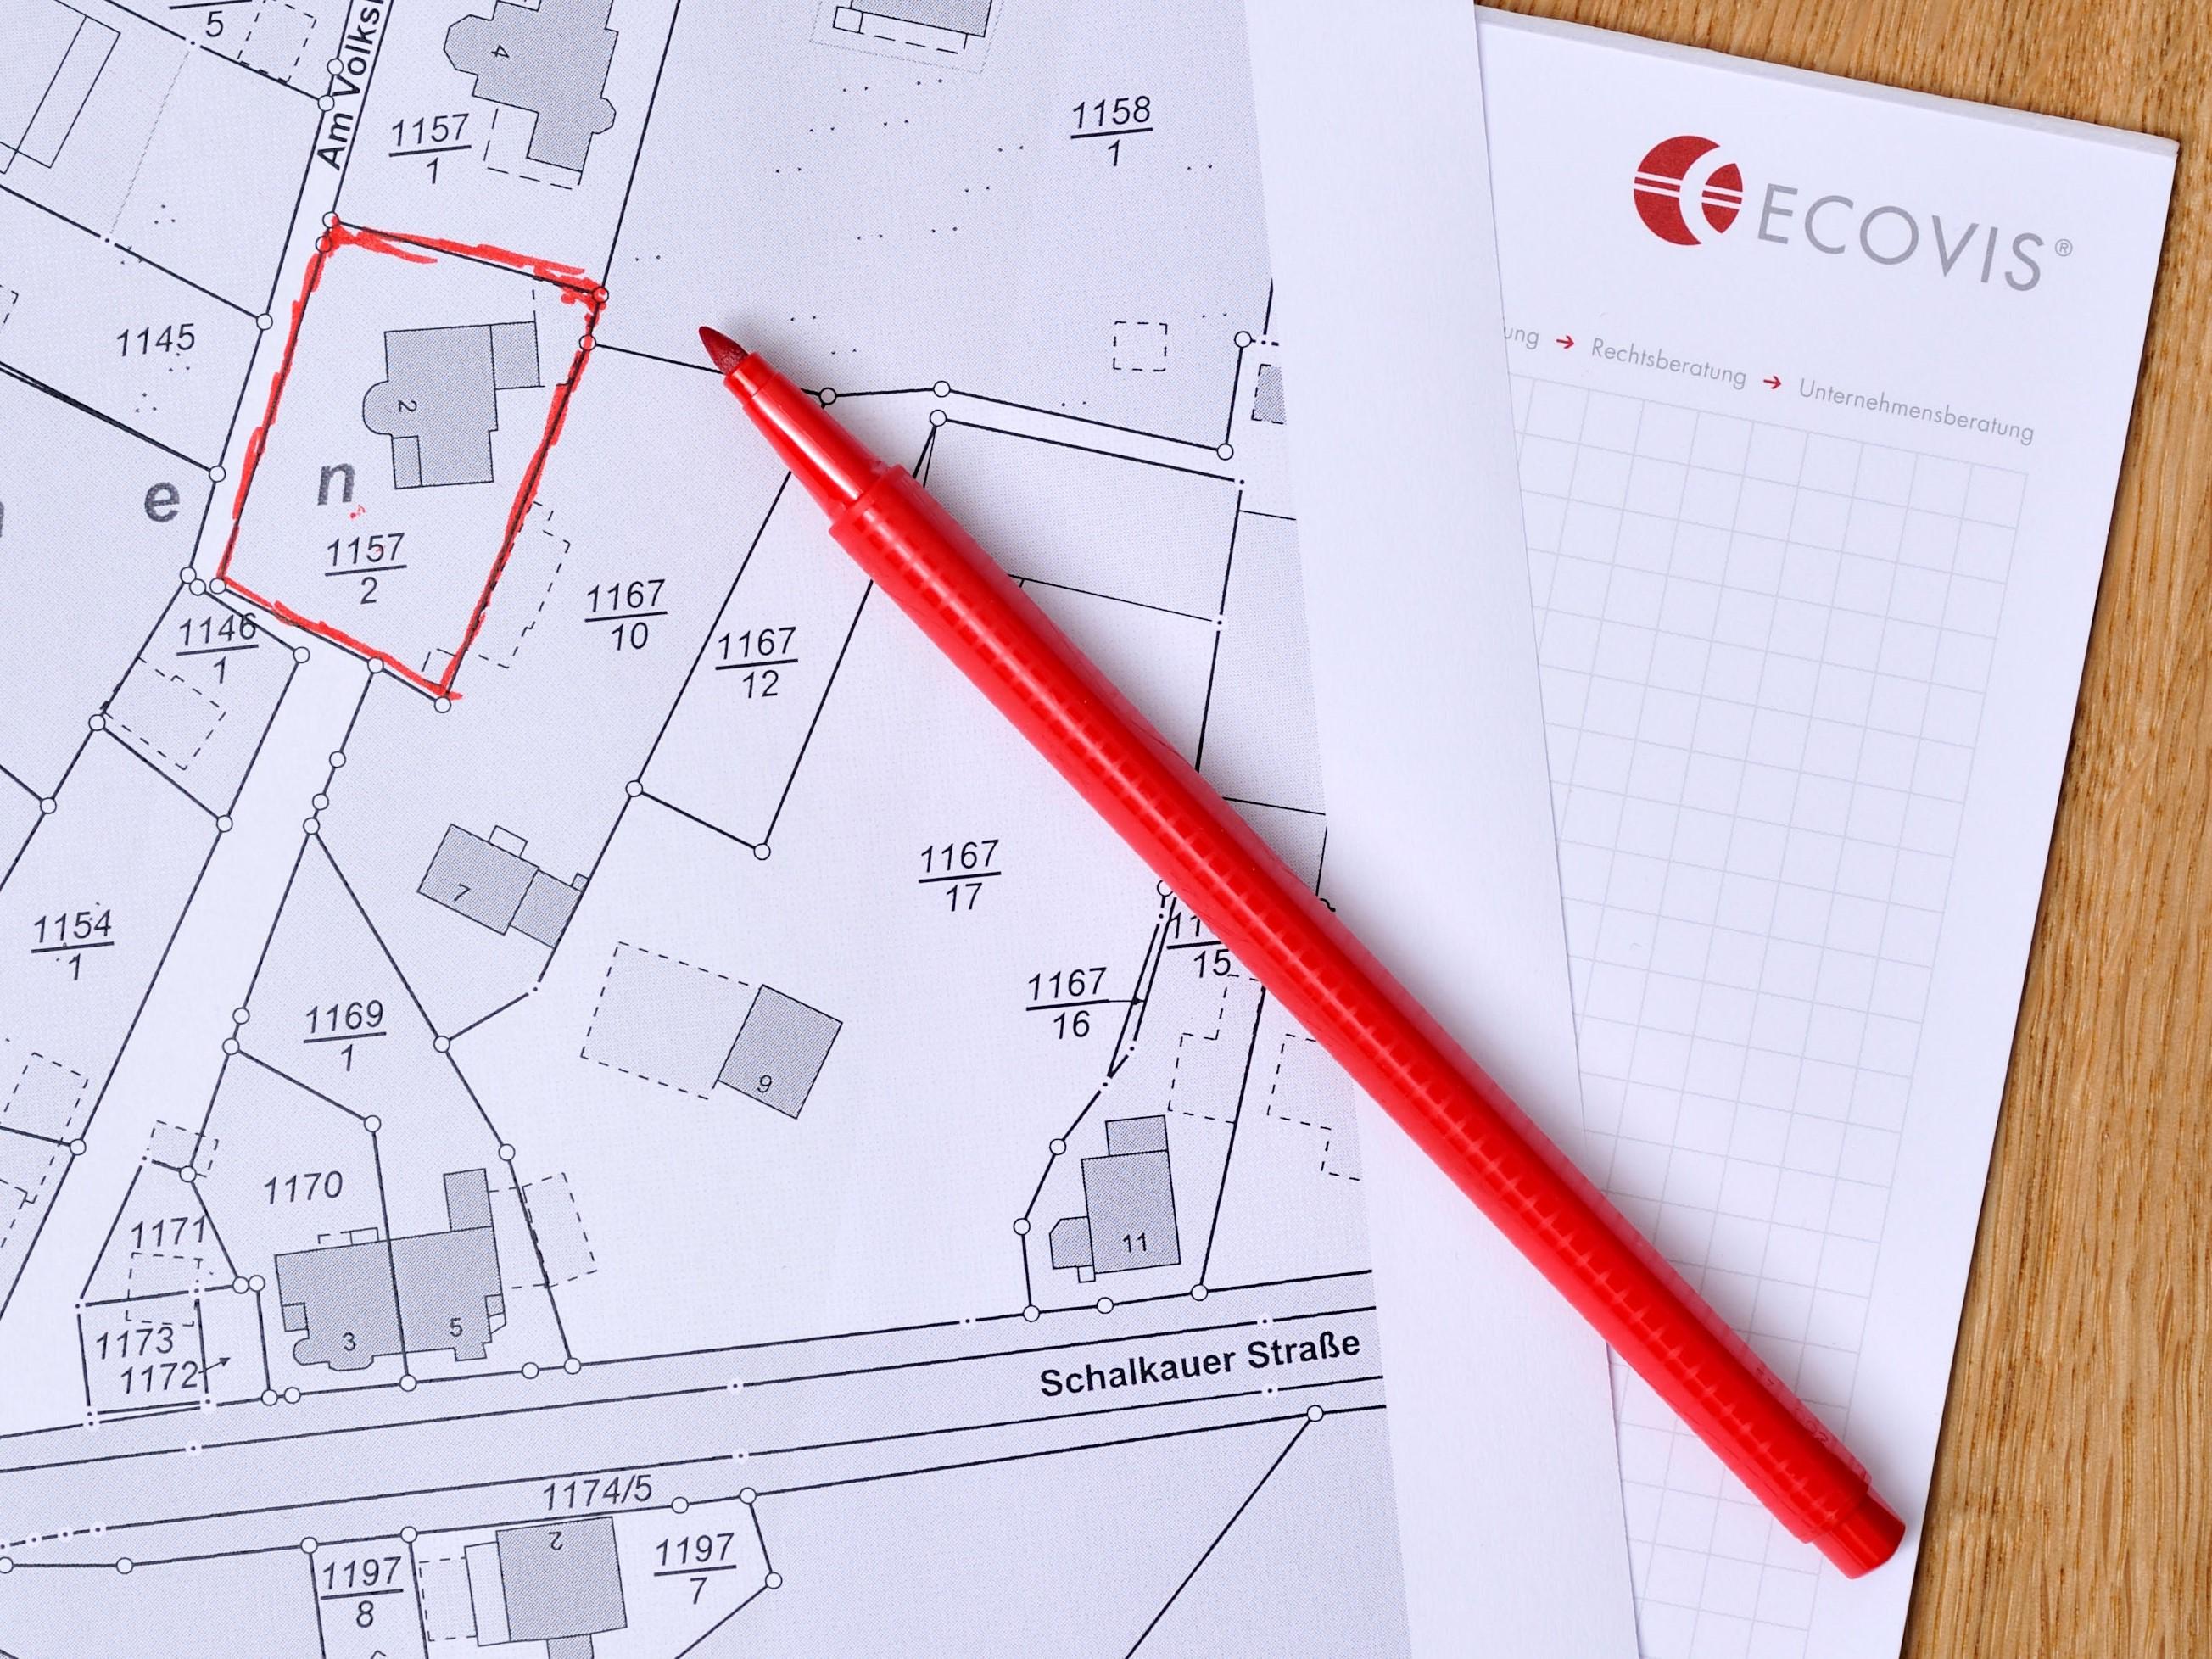 ECOVIS ježek lease of business premises